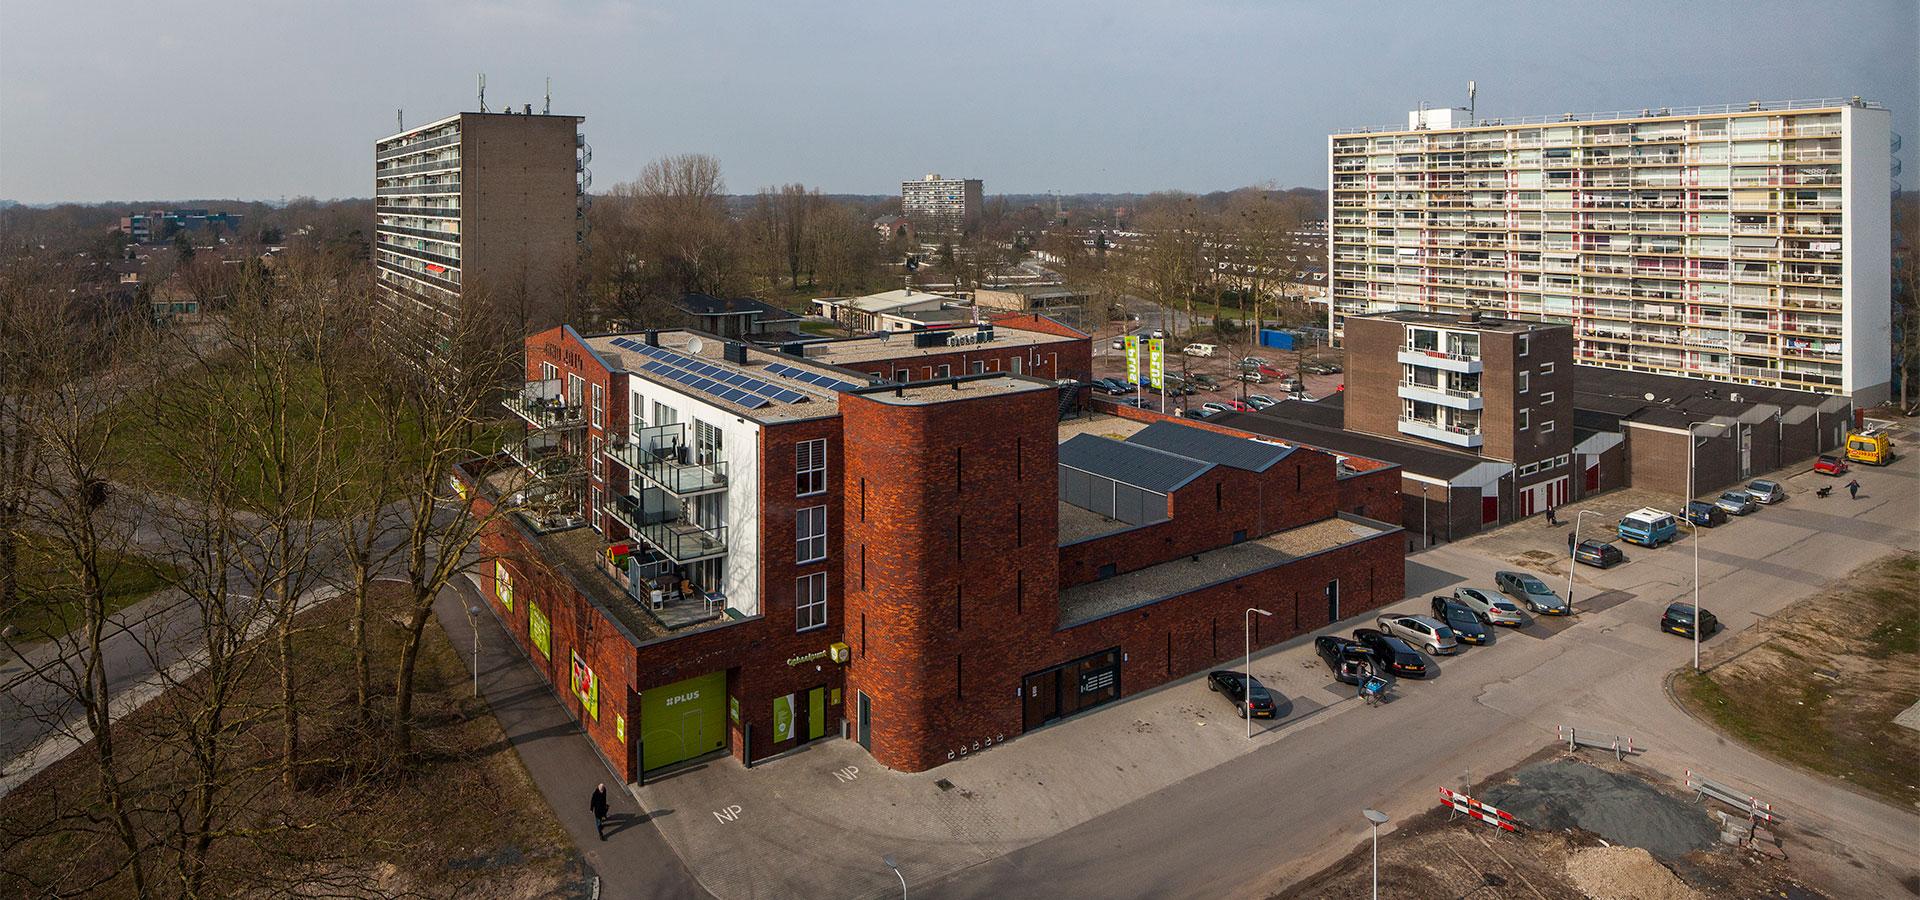 FARO architecten Borgele, Deventer 07